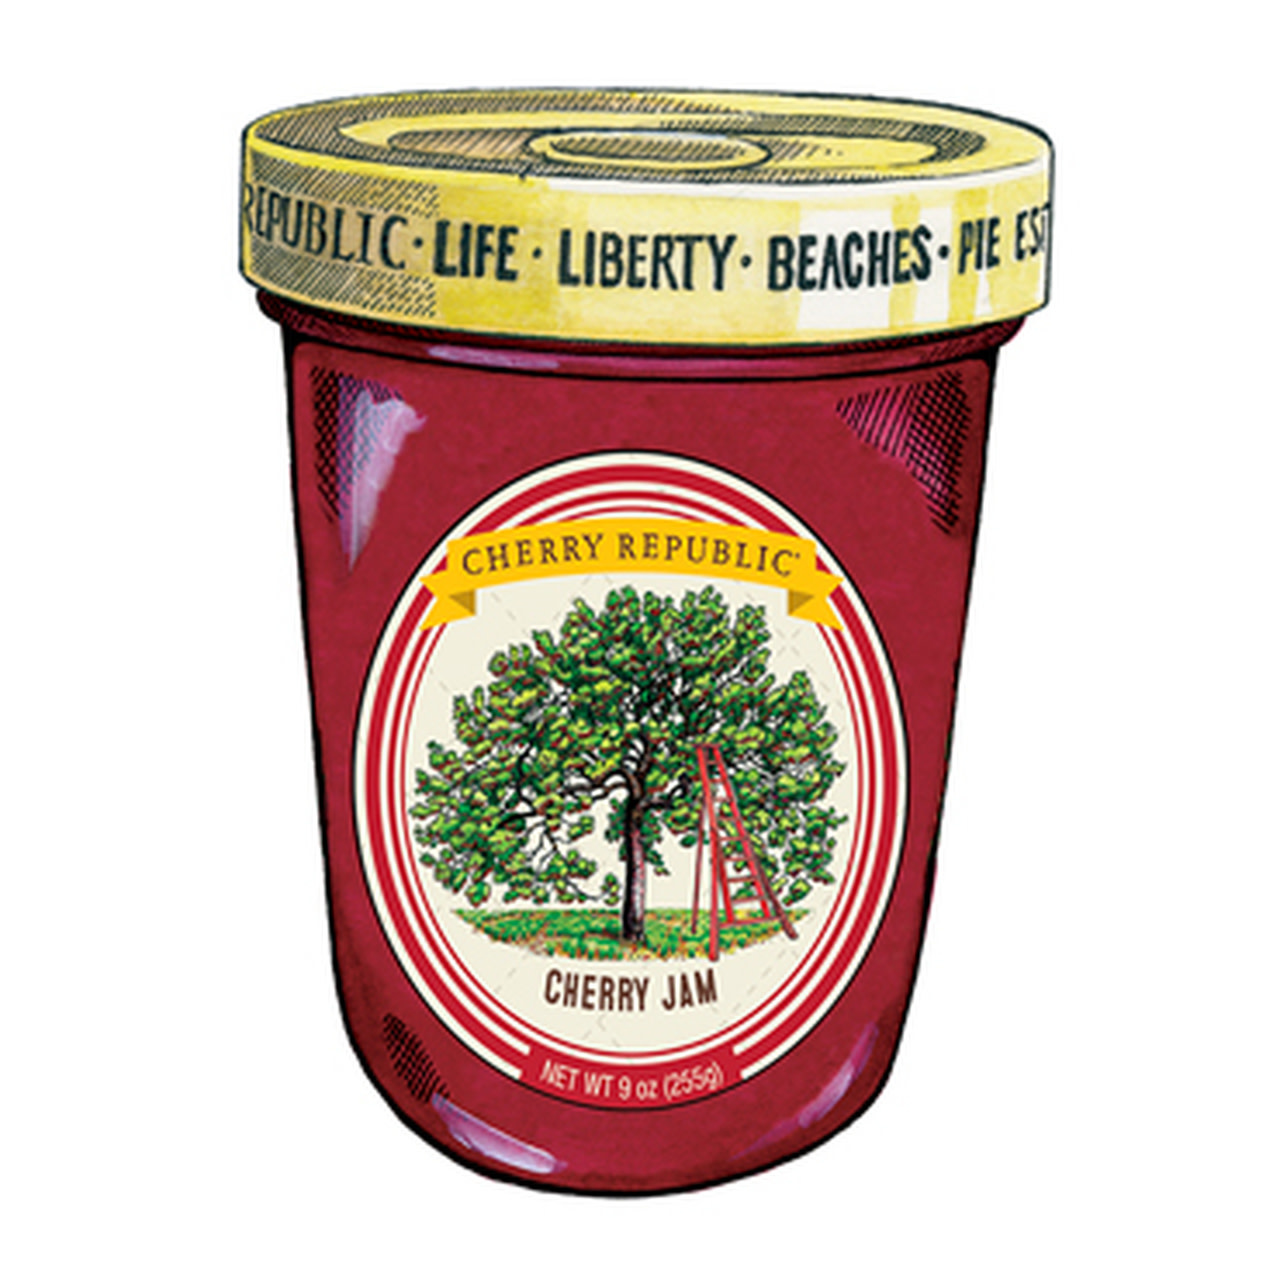 Cherry Republic Cherry Republic Cherry Jam 8.5oz